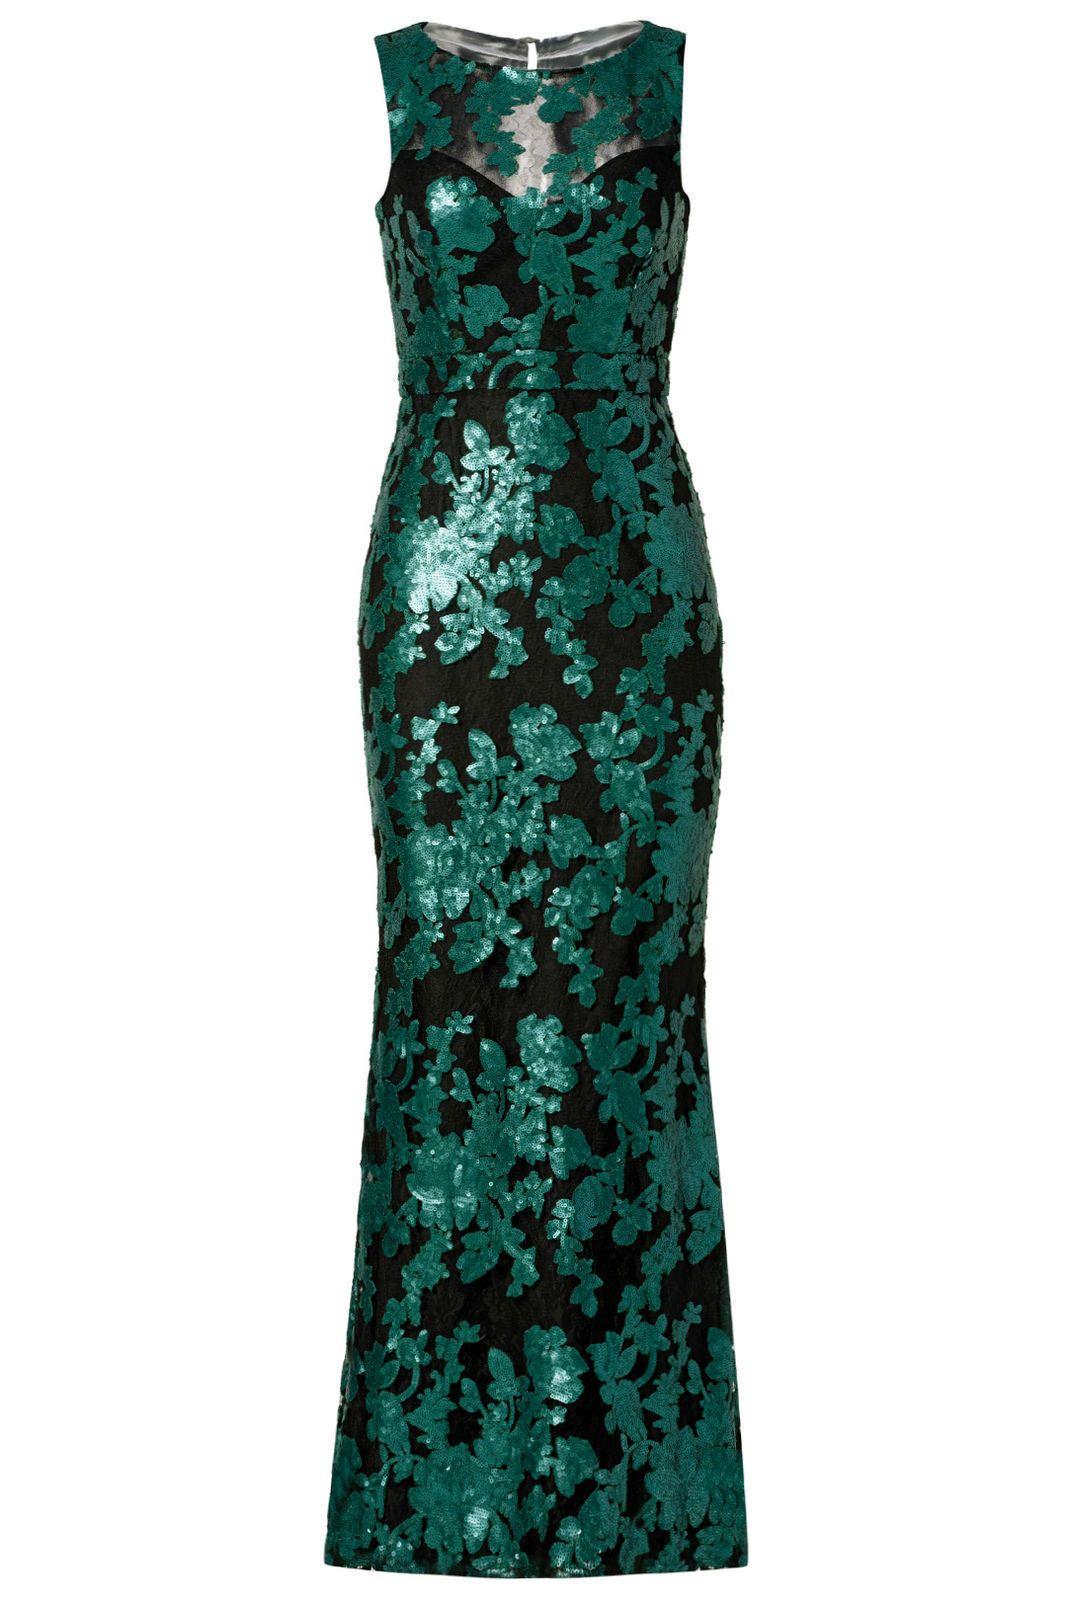 Cool great badgley mischka green black sequin womenus size ball